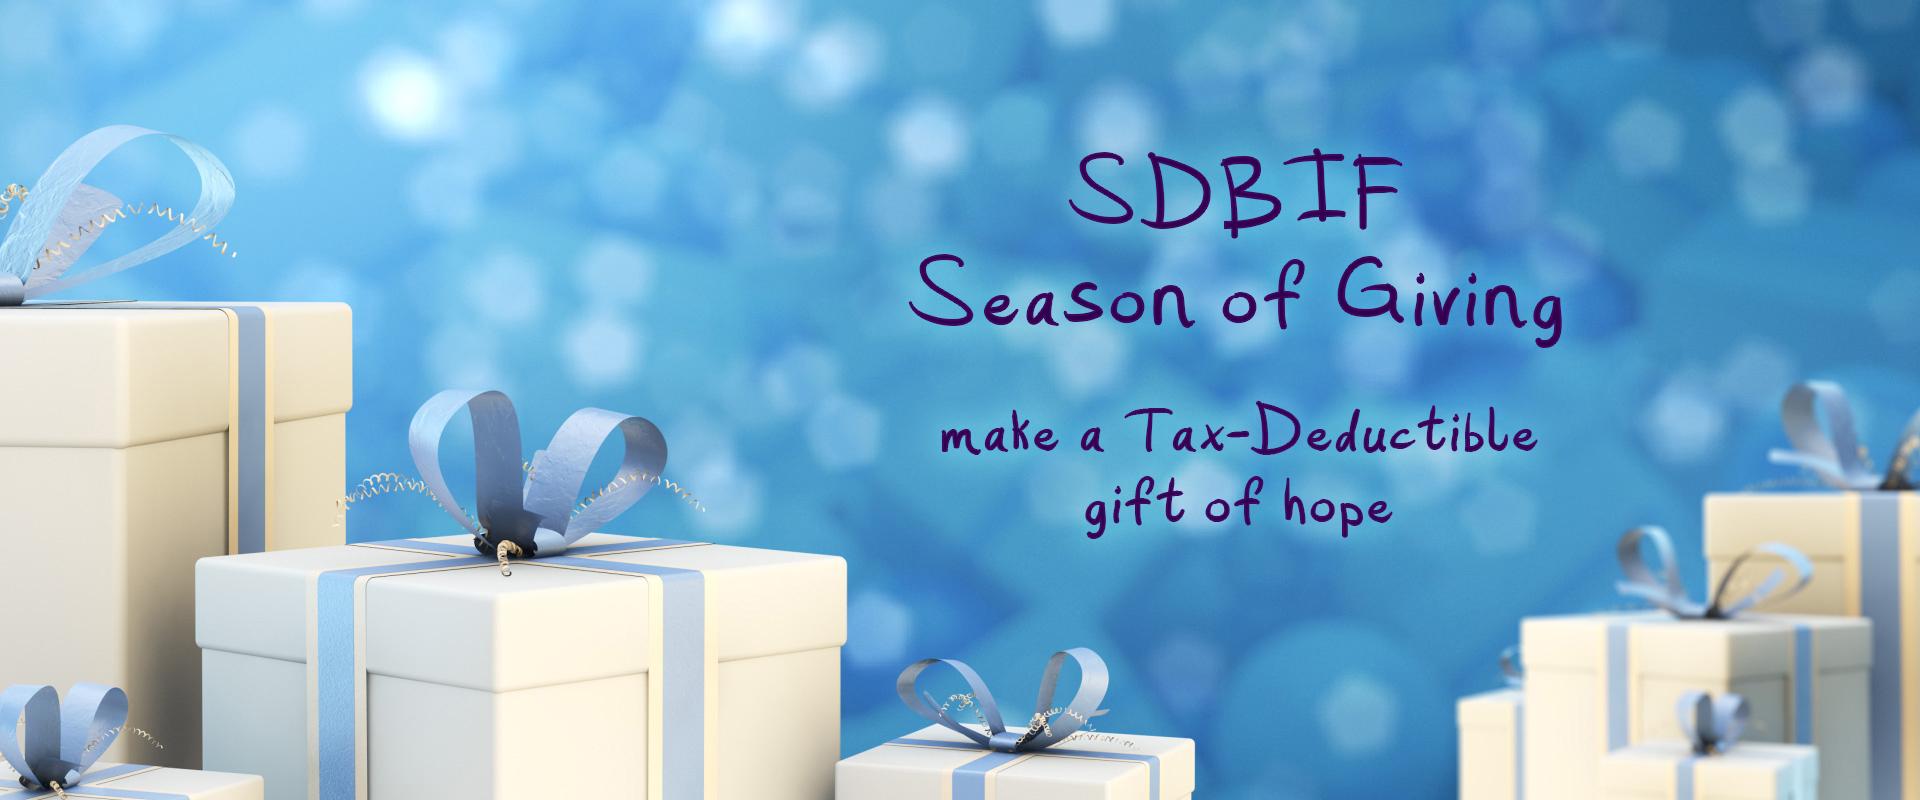 2018 SDBIF Season Of Giving